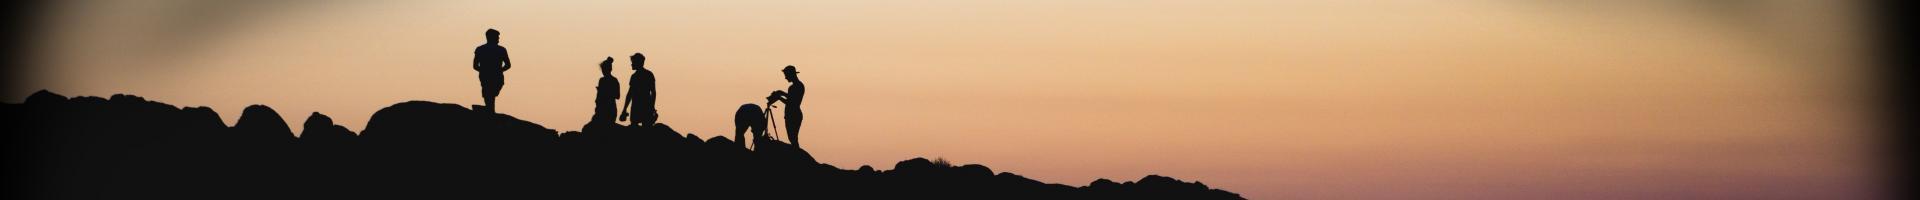 Catholic Climate Covenant - people on rocky landscape